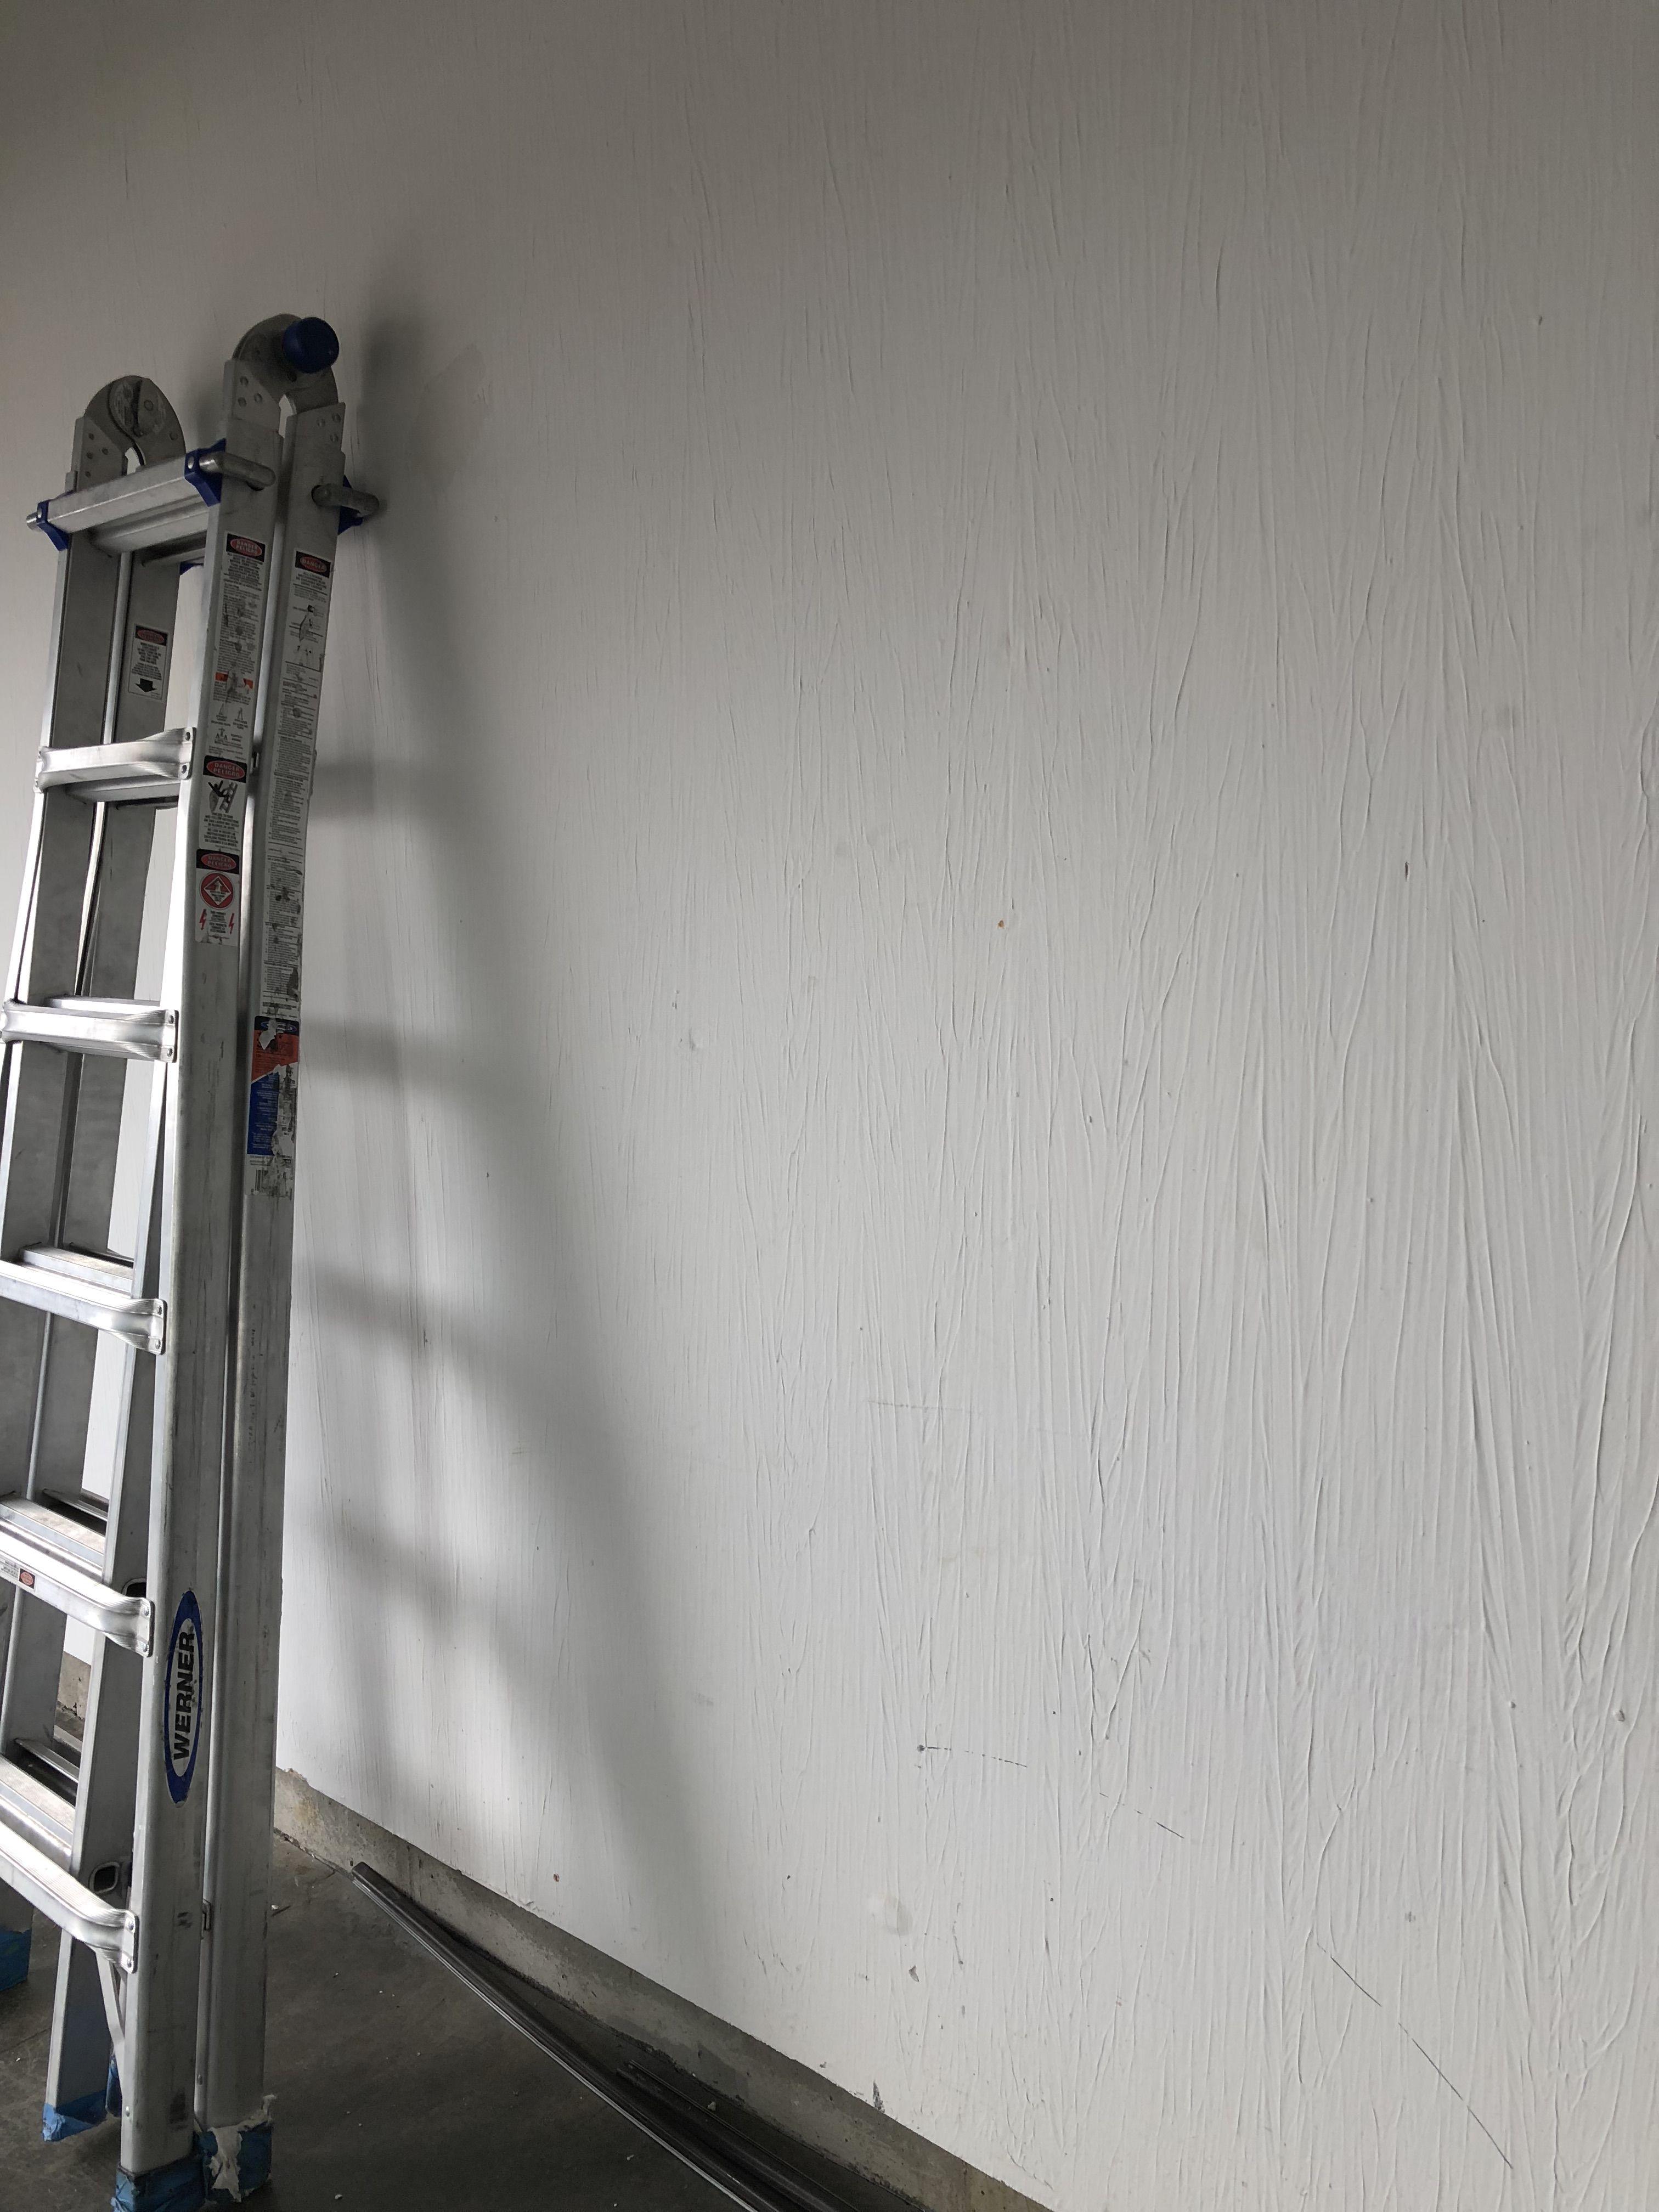 Drywall Roll And Texture Garage Walls Garage Walls Garage Wall